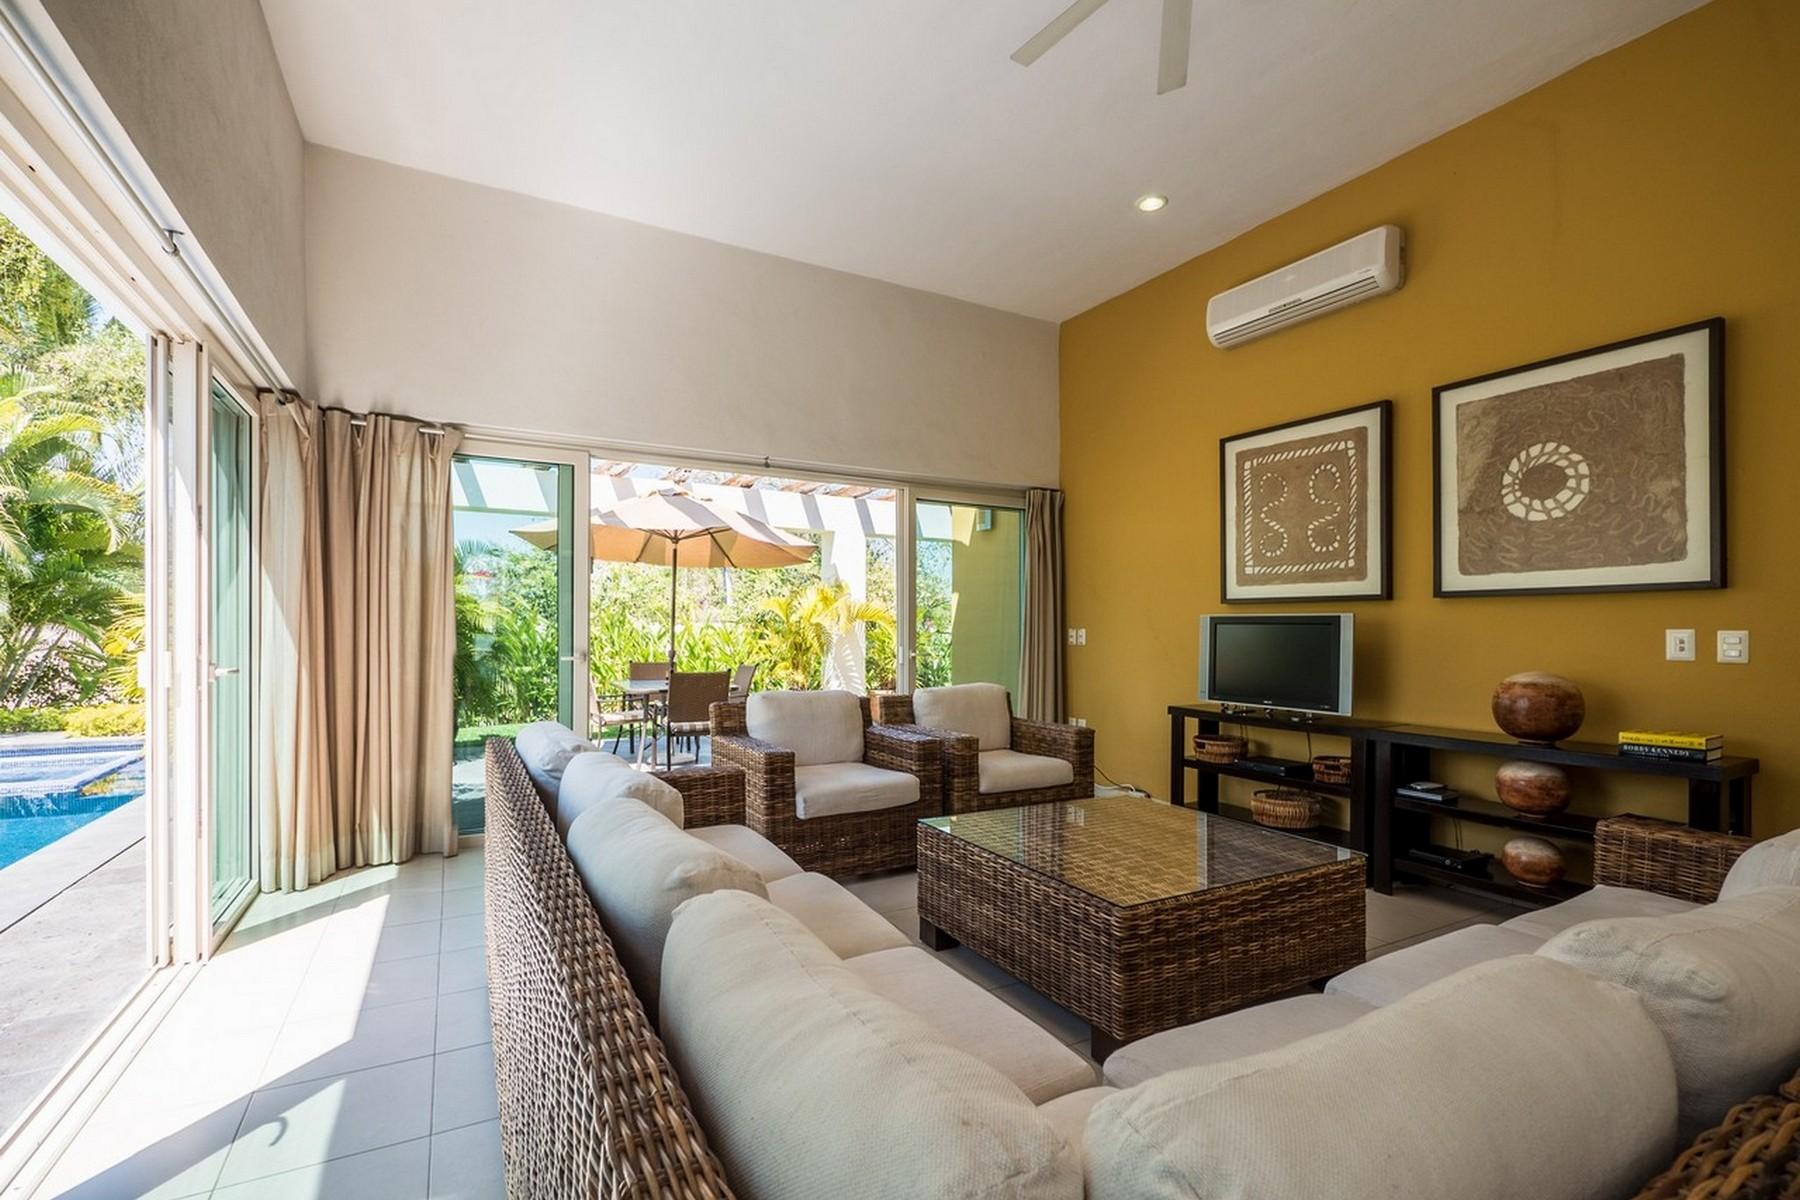 Additional photo for property listing at Casa Mariposas 124 Paseo de las Mariposas 124 Nuevo Vallarta, Nayarit 63735 México